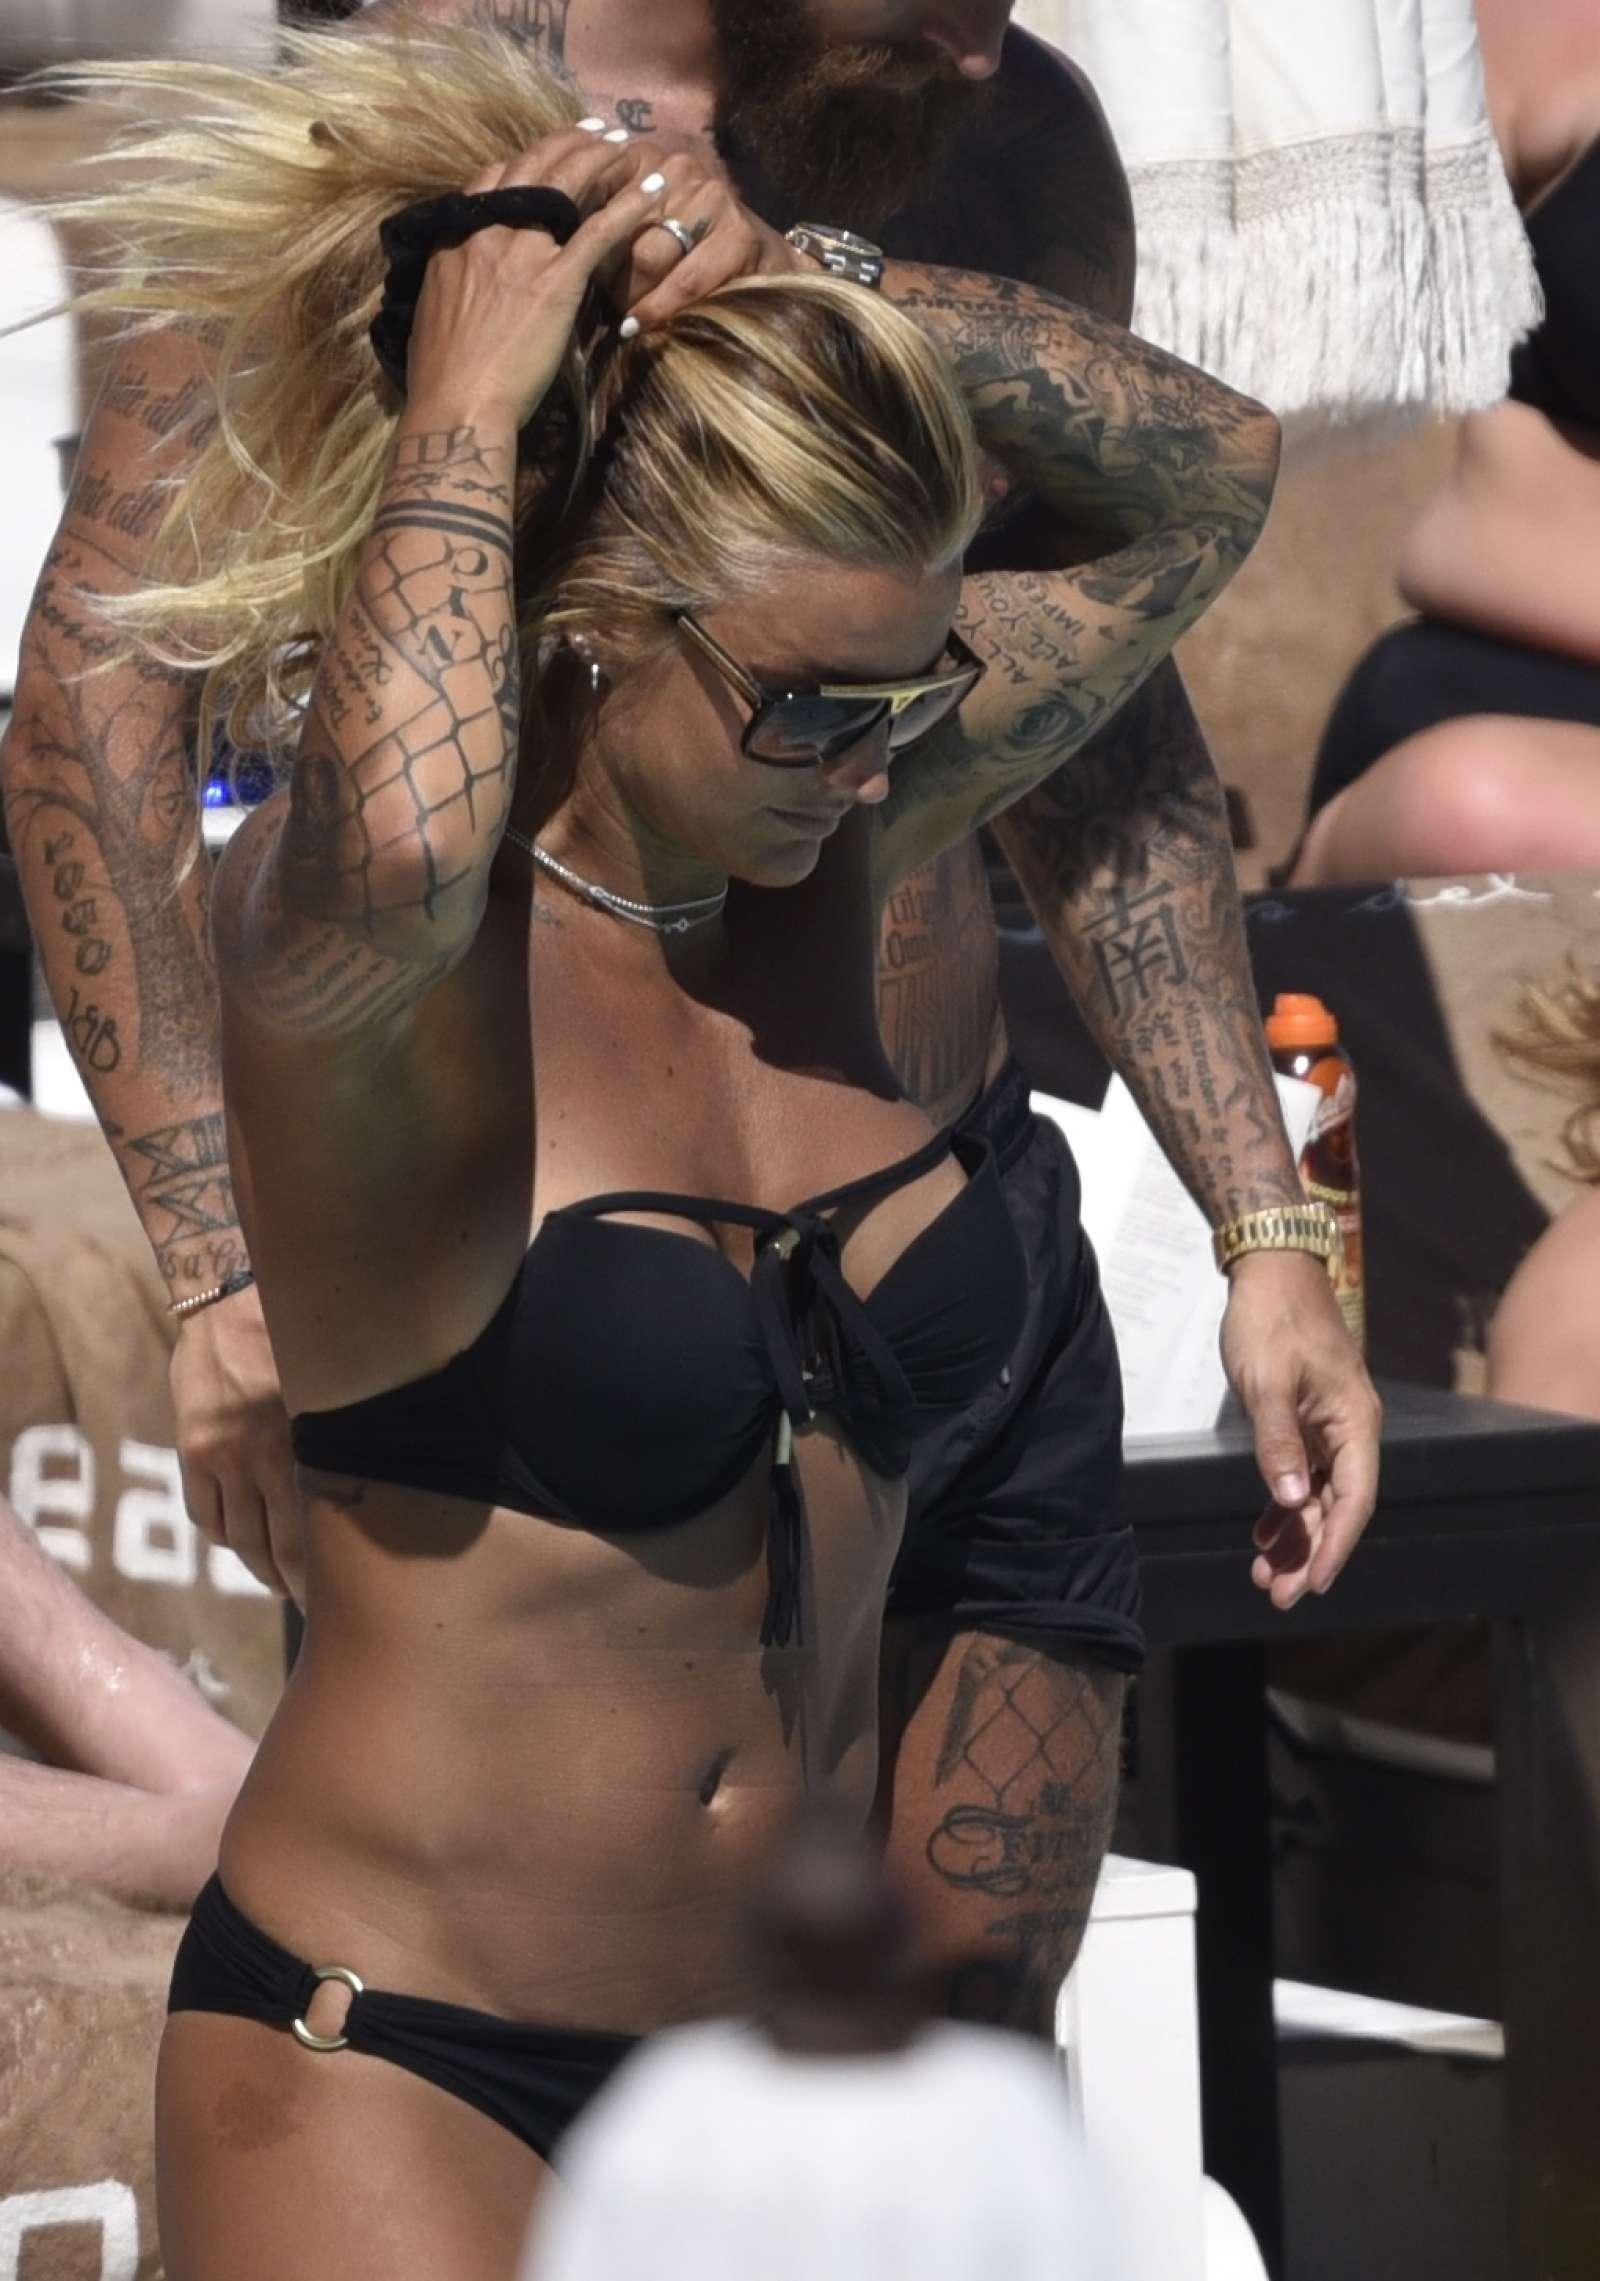 Bikini Madeleine Vall Beijner nude (53 foto and video), Ass, Bikini, Instagram, underwear 2018